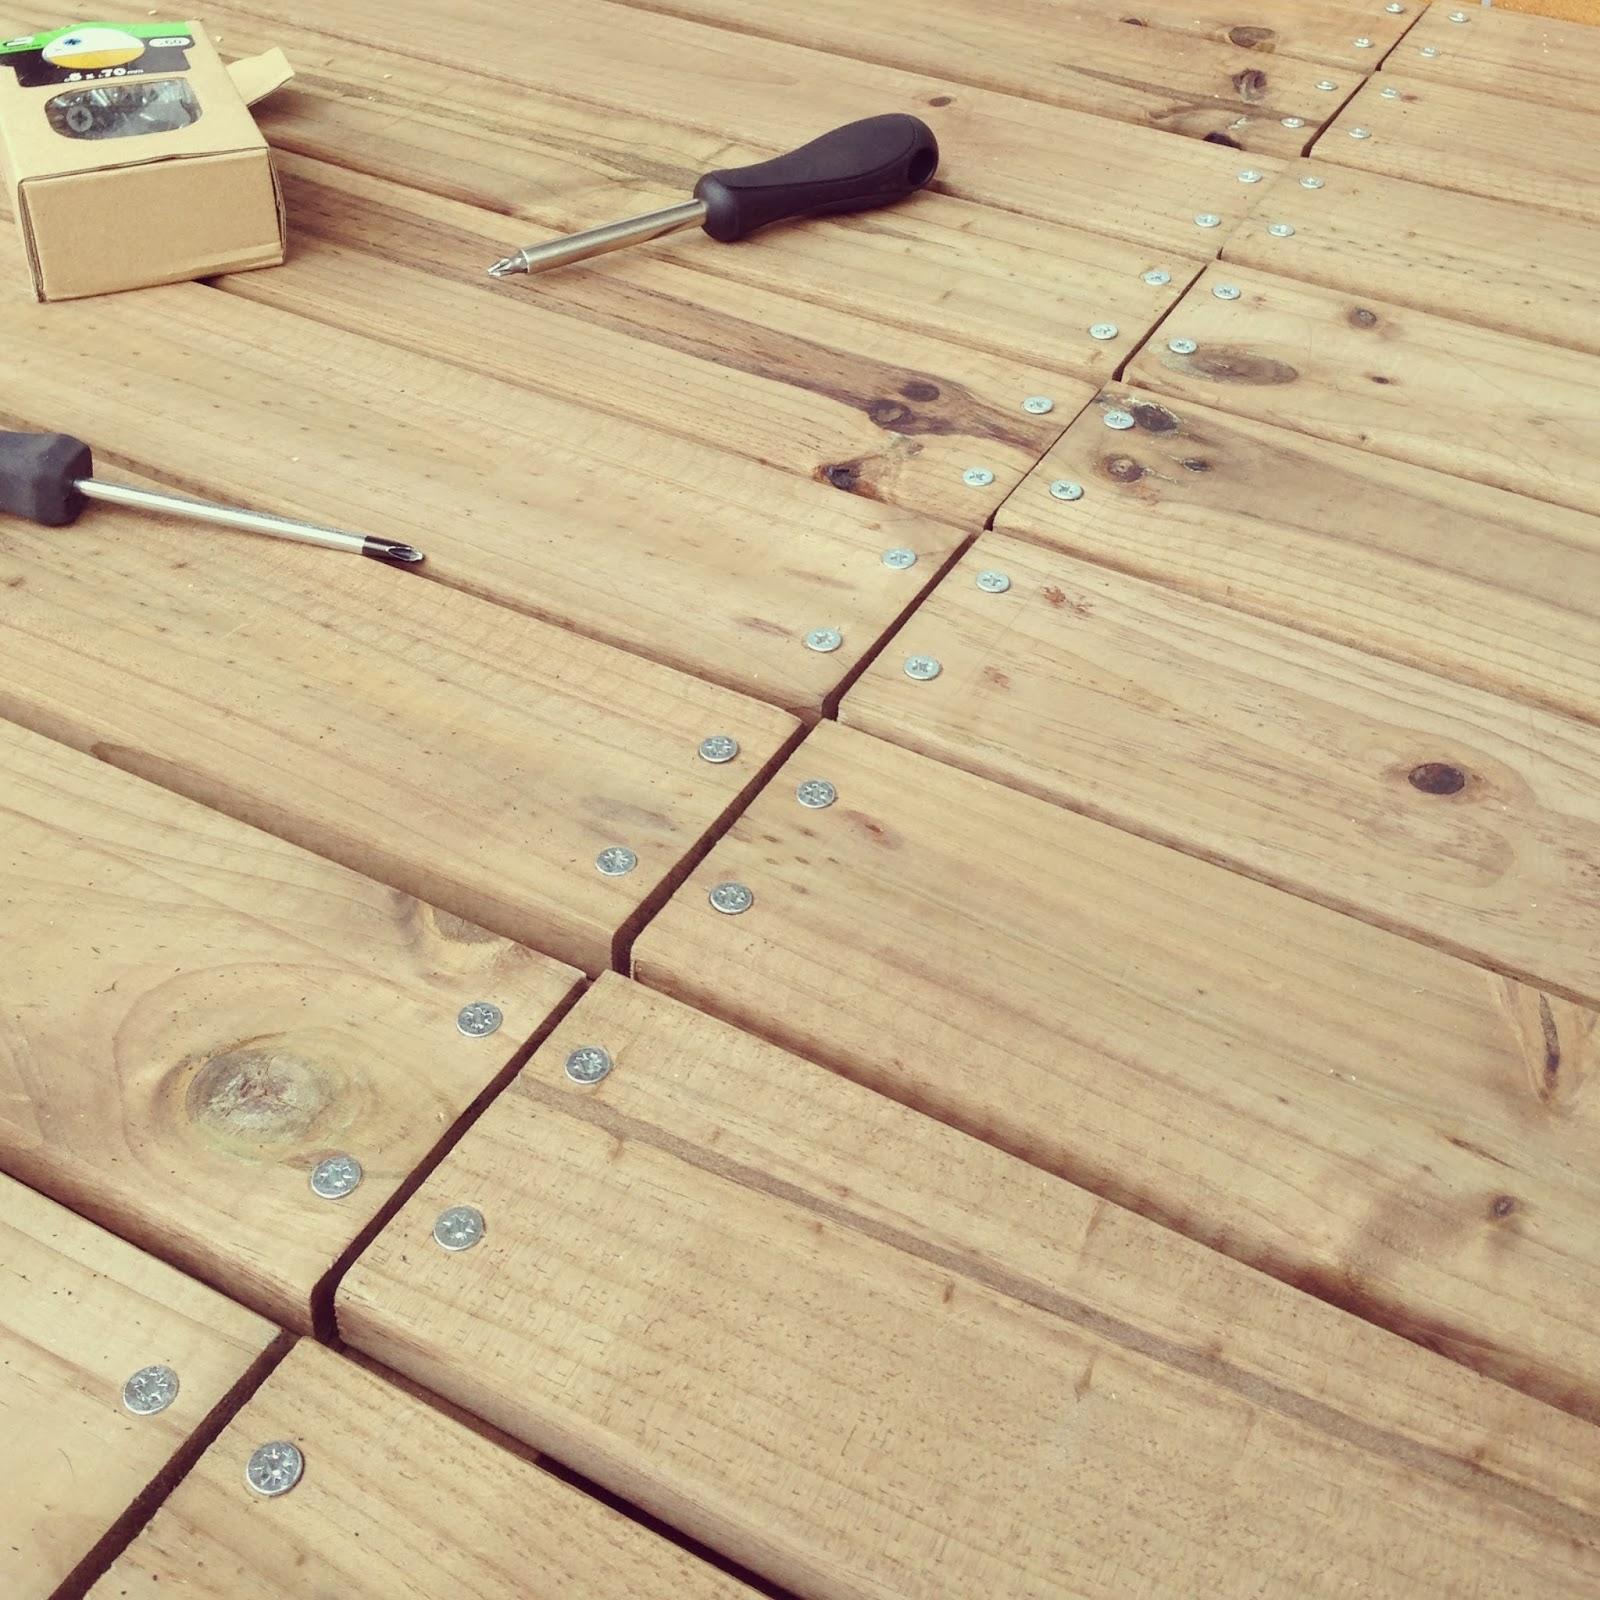 Realizaci n de una tarima de madera para terraza rojosill n - Tarimas de madera para exteriores ...